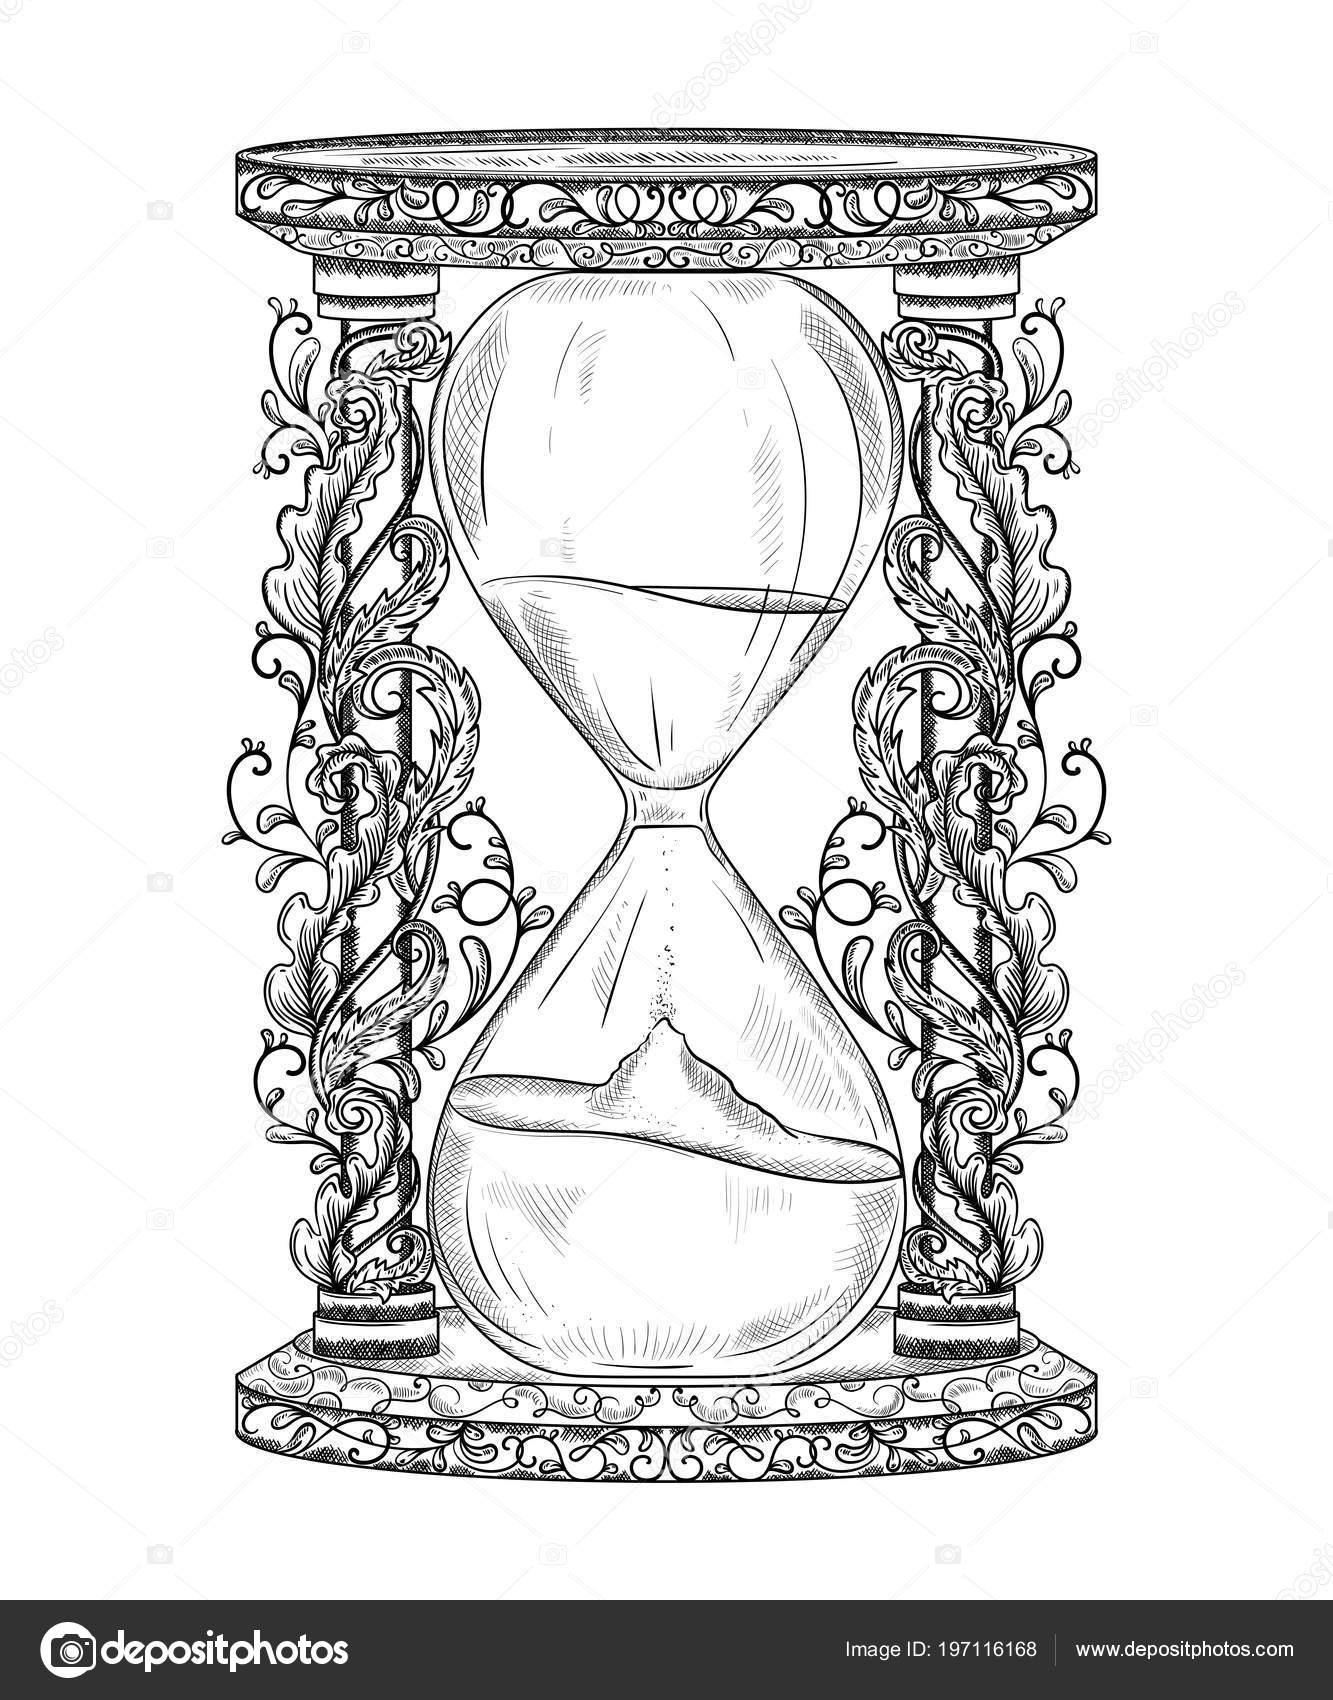 Vintage Reloj Arena Con Ornamento Floral Estilo Grabado Objeto